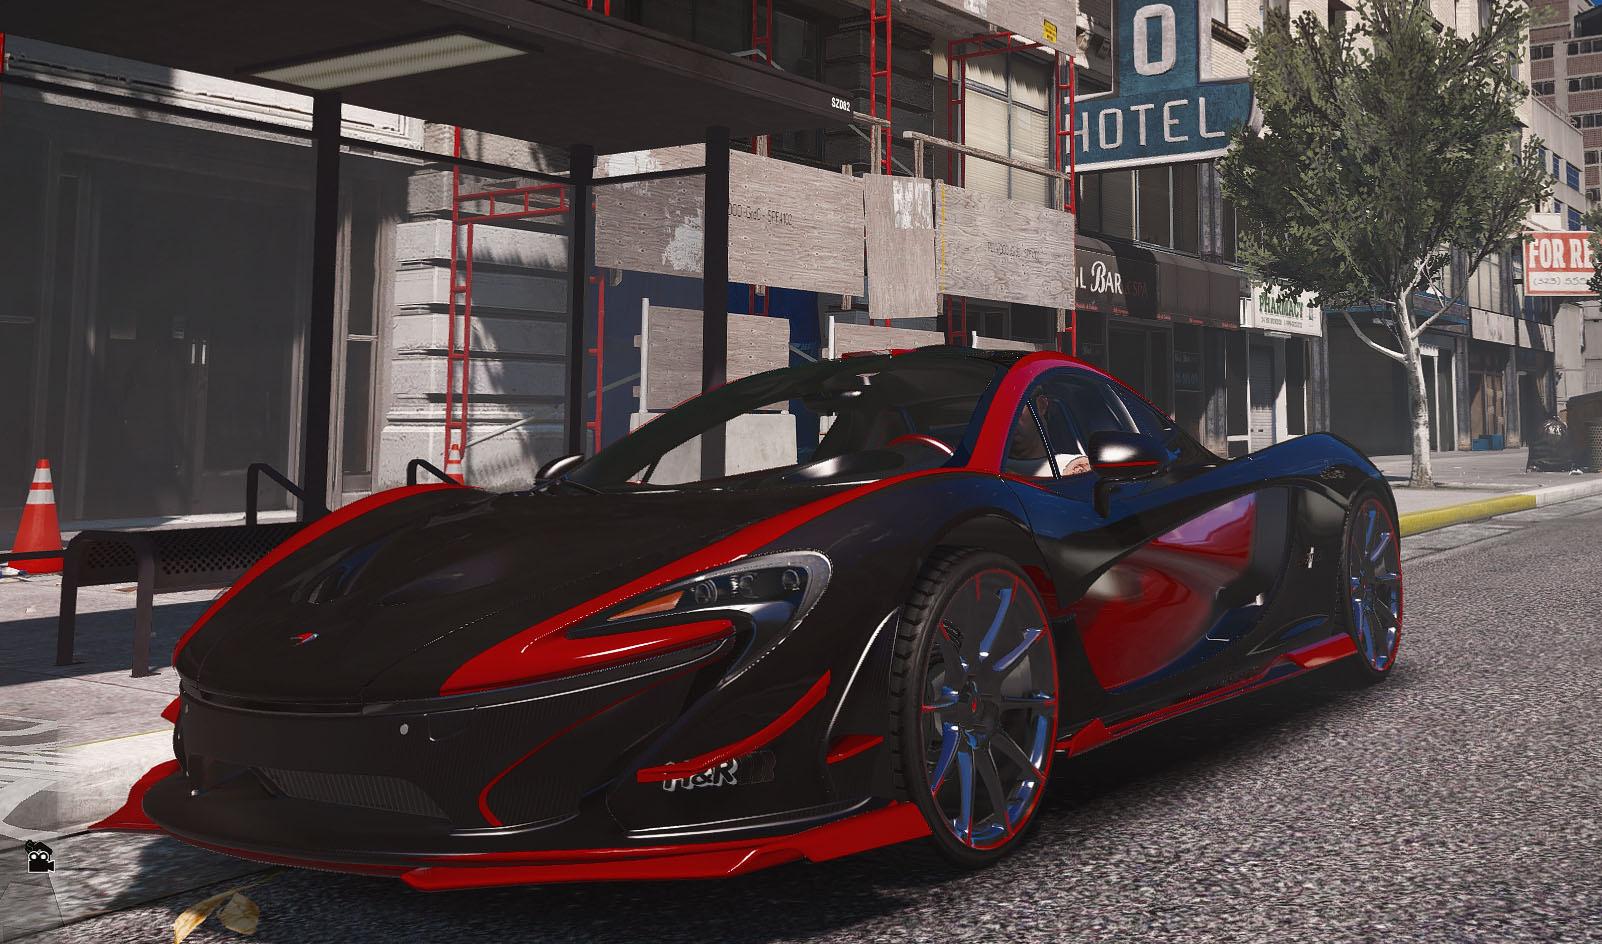 2013 McLaren P1 [Add-On | Tuning] - GTA5-Mods.com